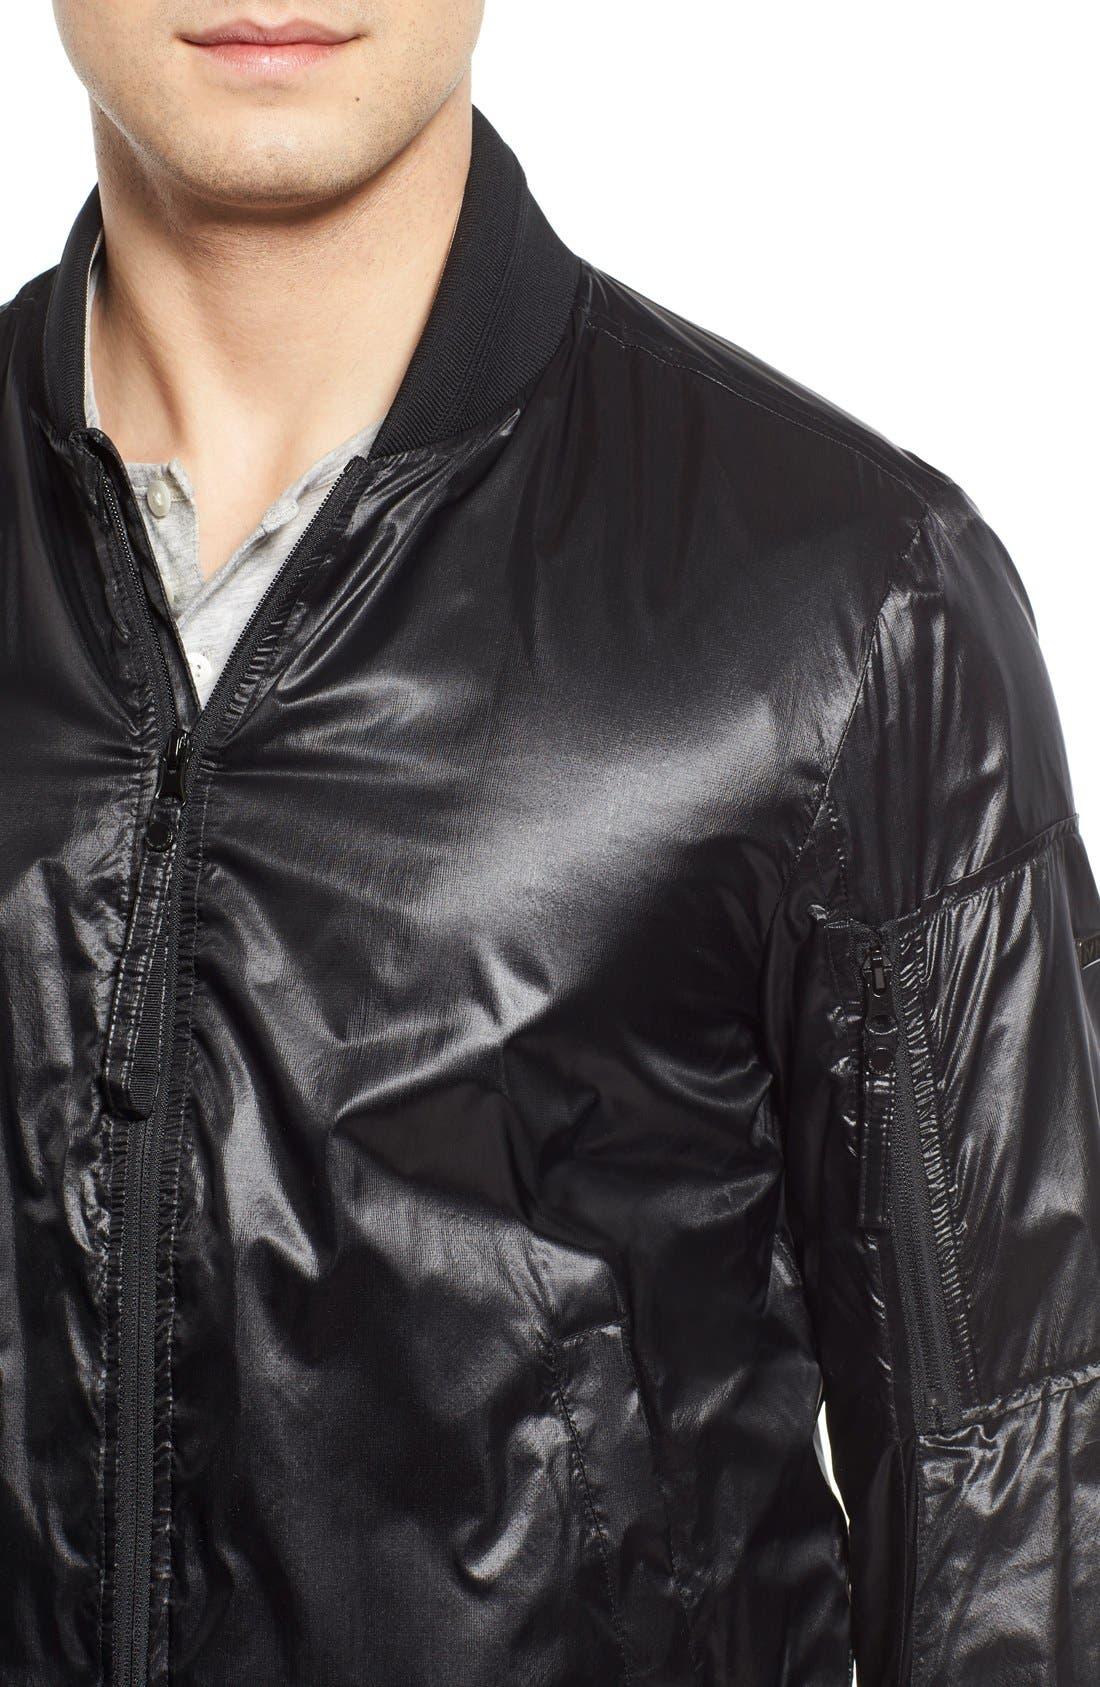 Windbreaker Bomber Jacket,                             Alternate thumbnail 2, color,                             Black